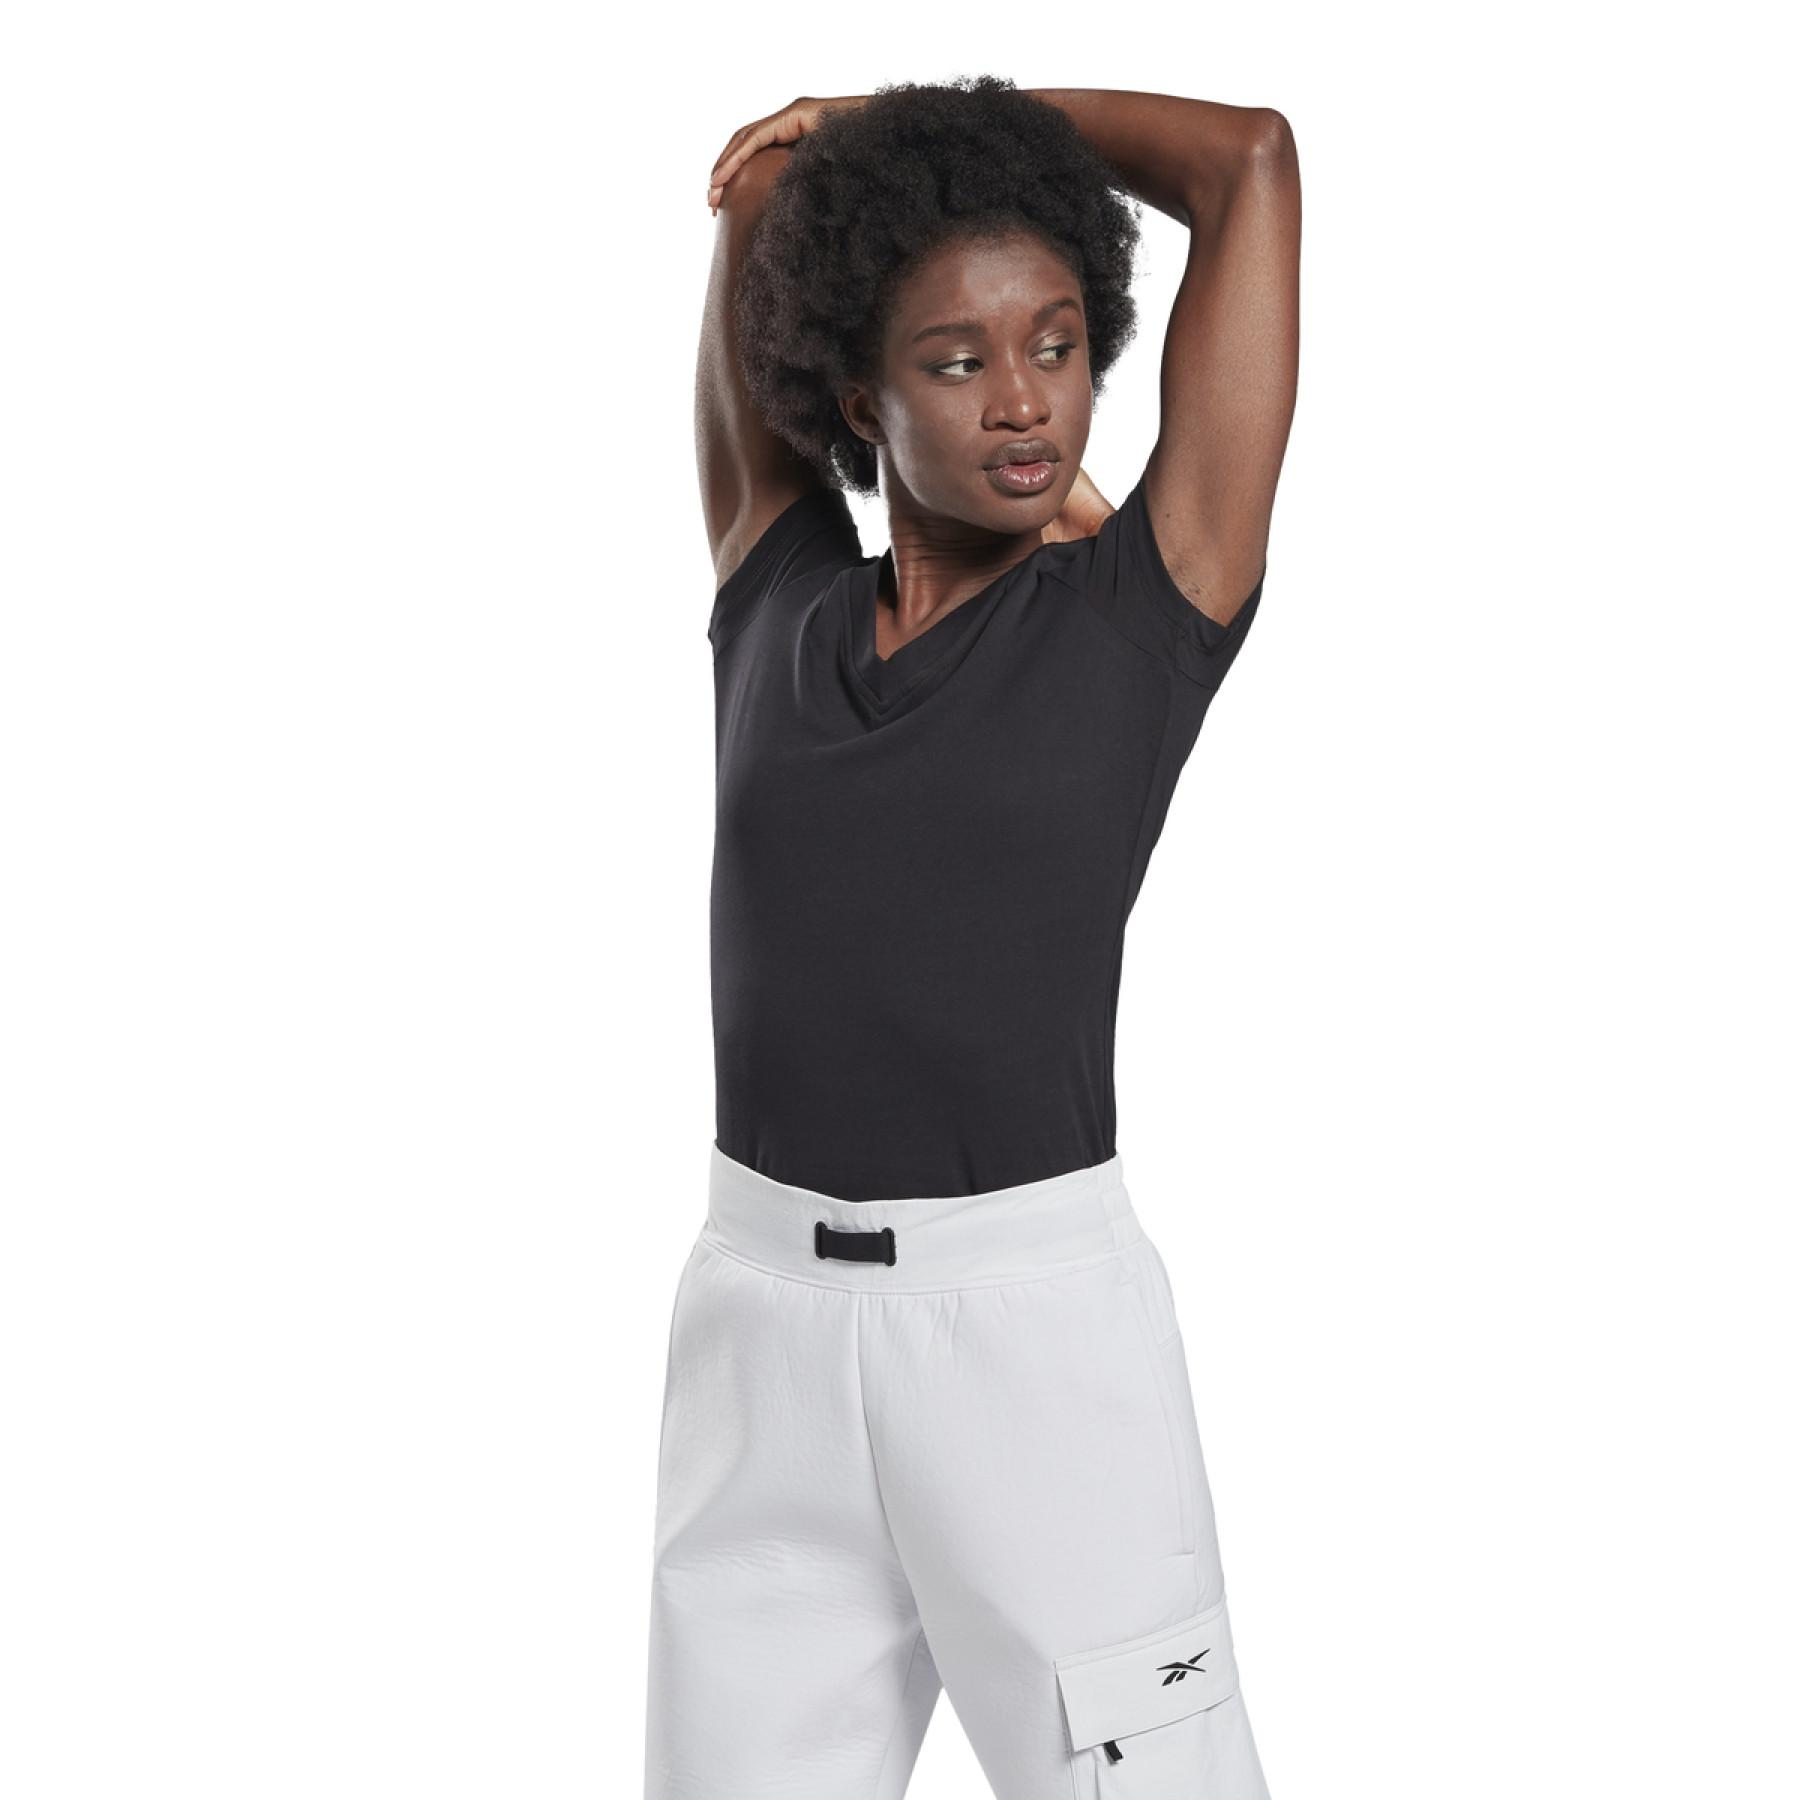 T-shirt woman Reebok GB Cotton V-Neck Vector